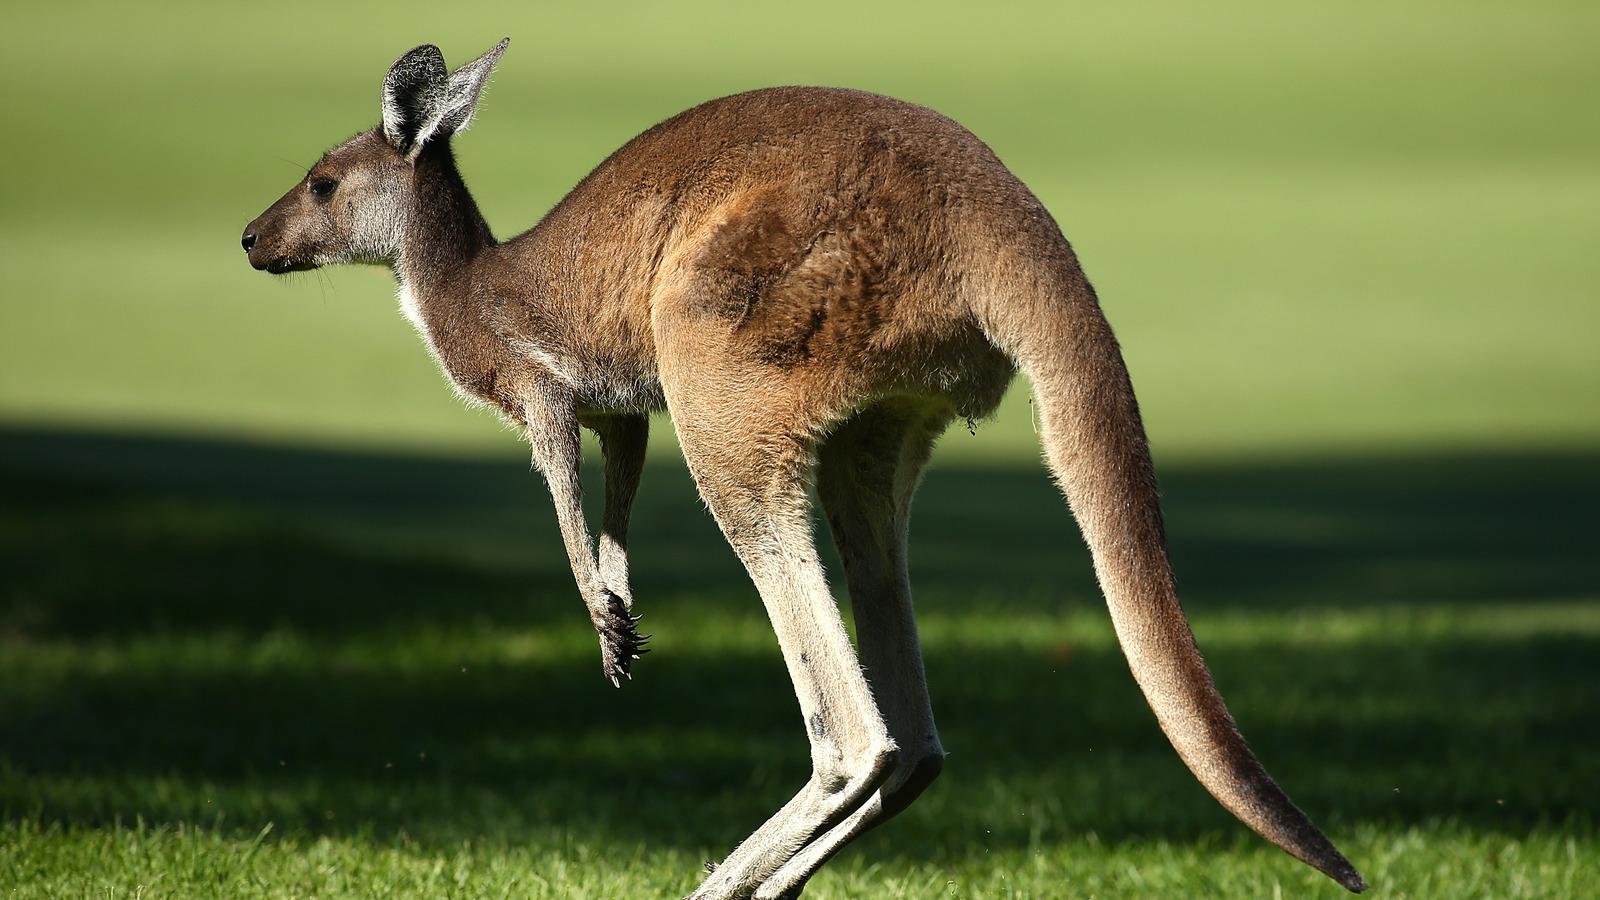 Aussie golfer expertly navigates mob of kangaroos on course | Yardbarker.com